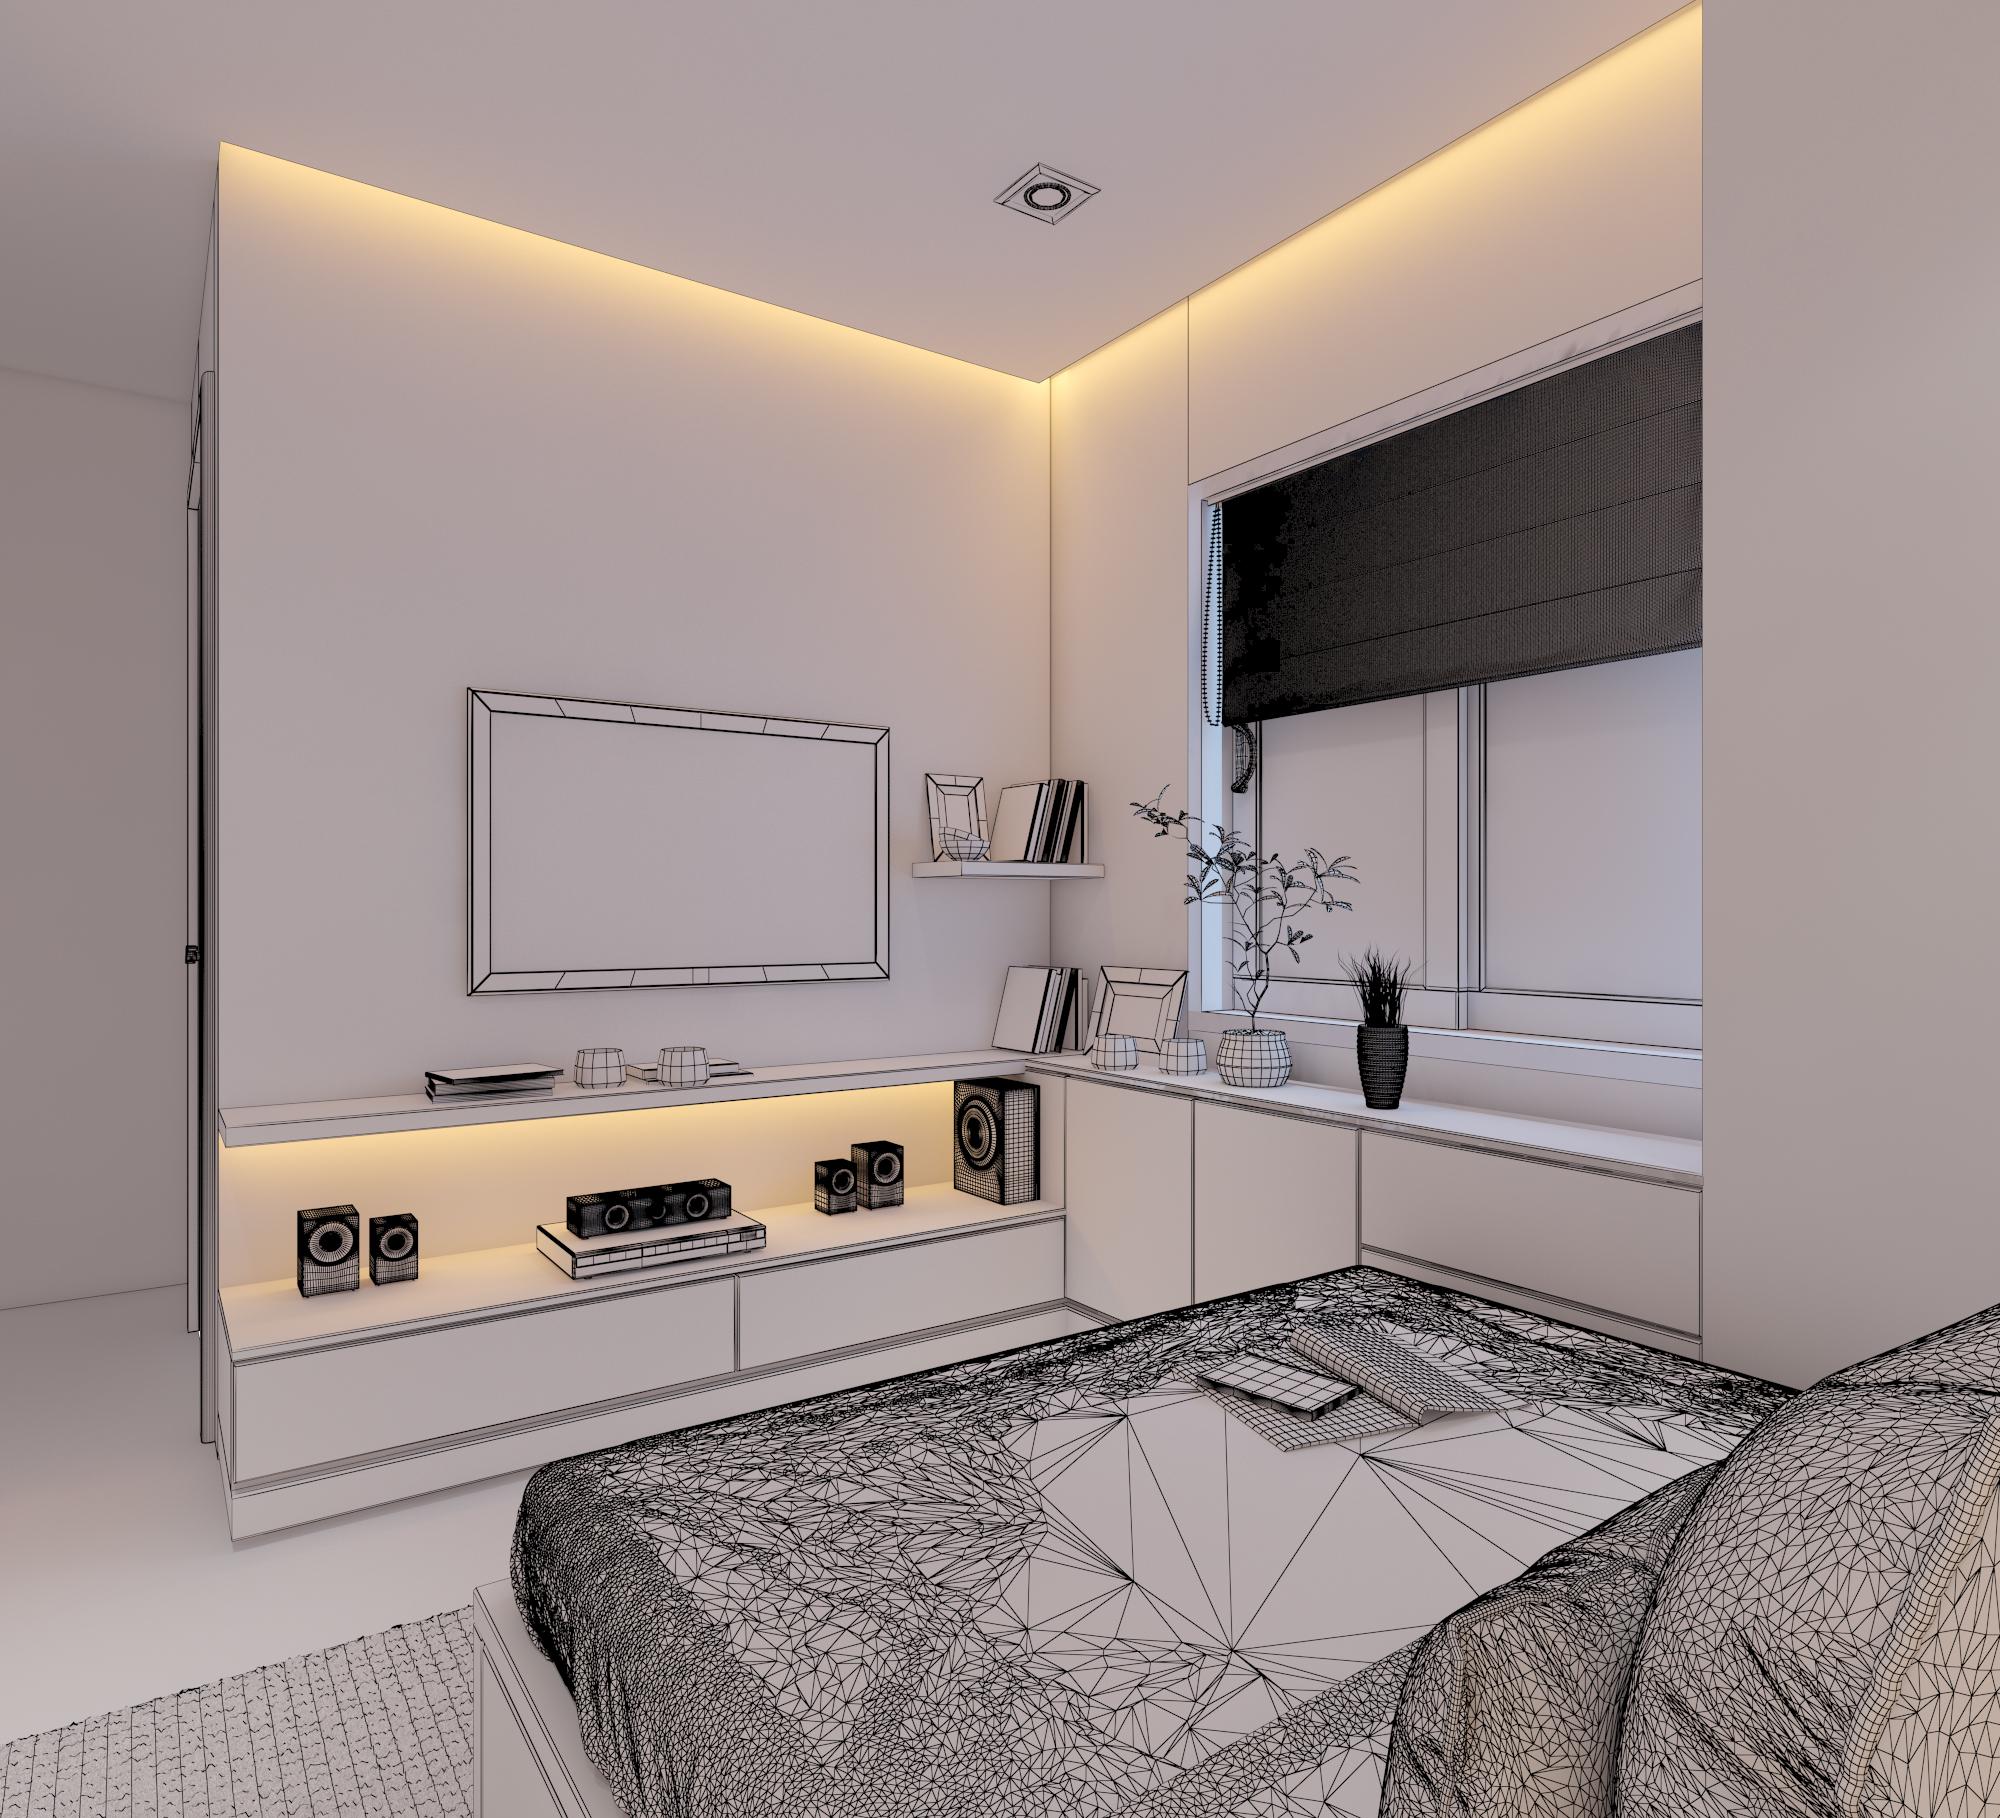 Cutaway apartment full furnitures modern design 3d model max 279971